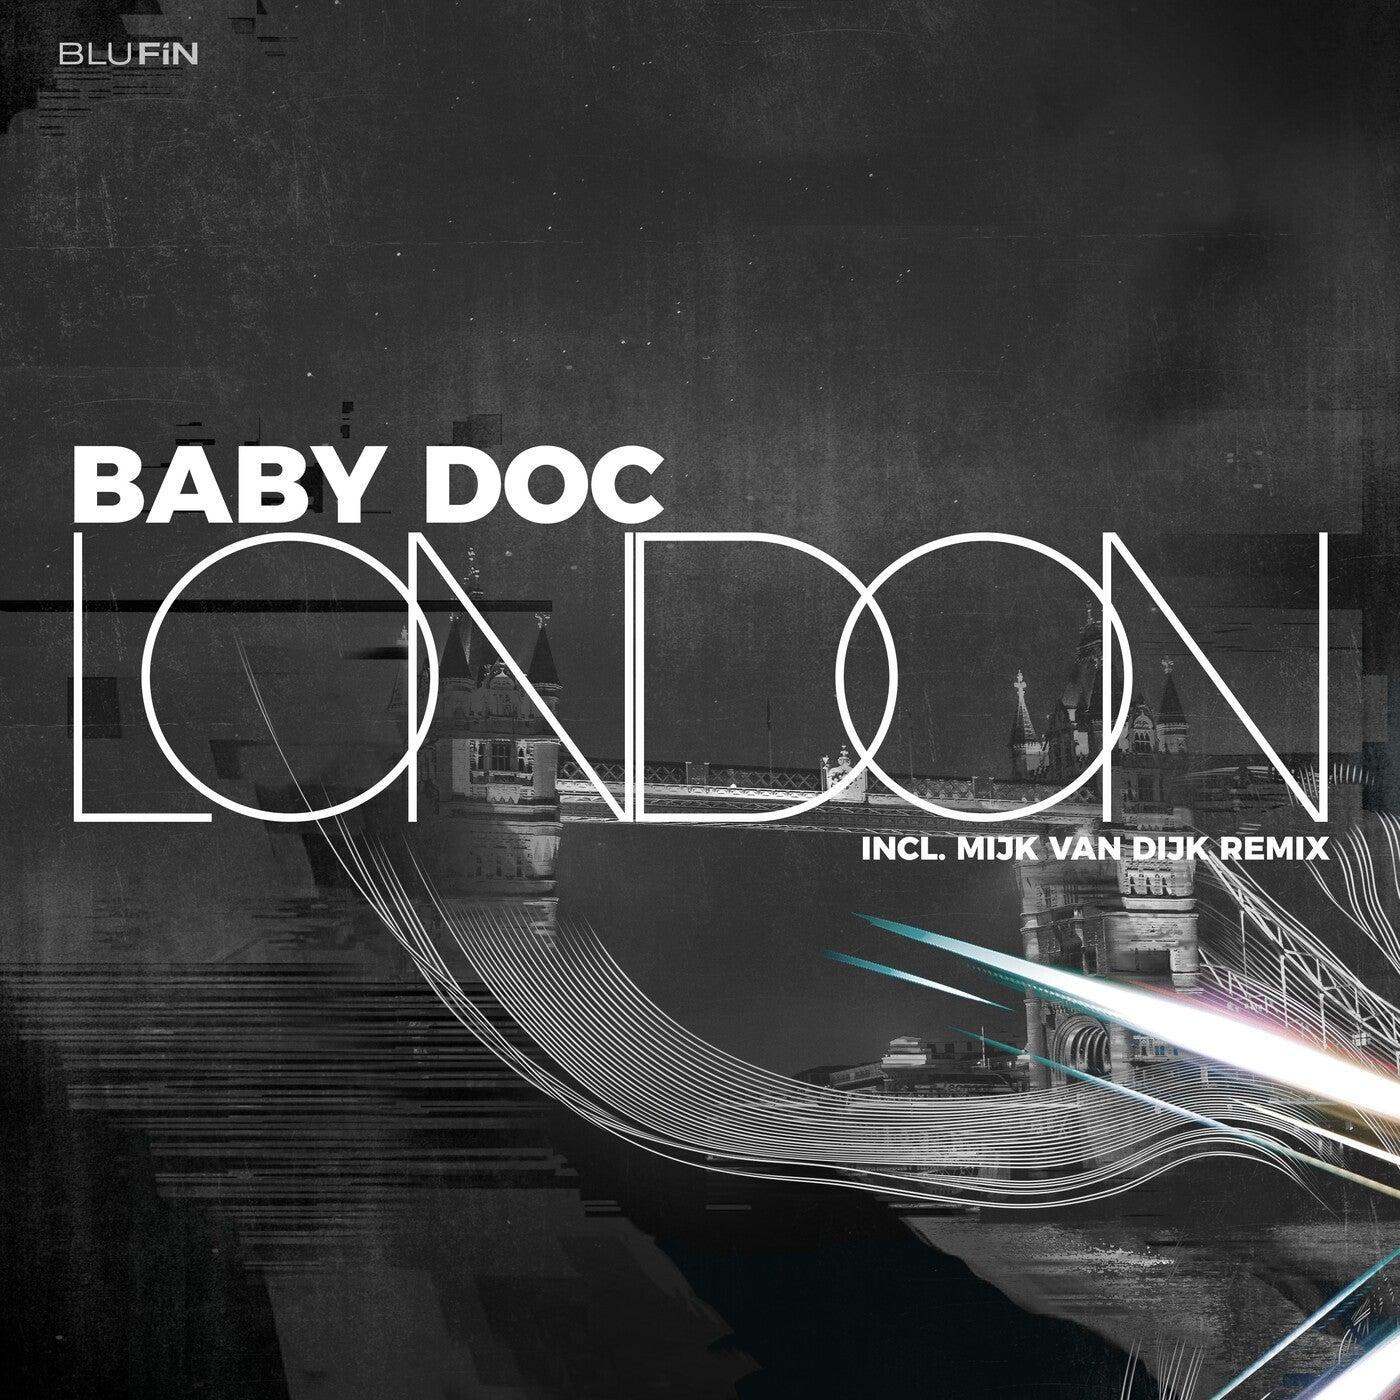 BabyDoc-London_small